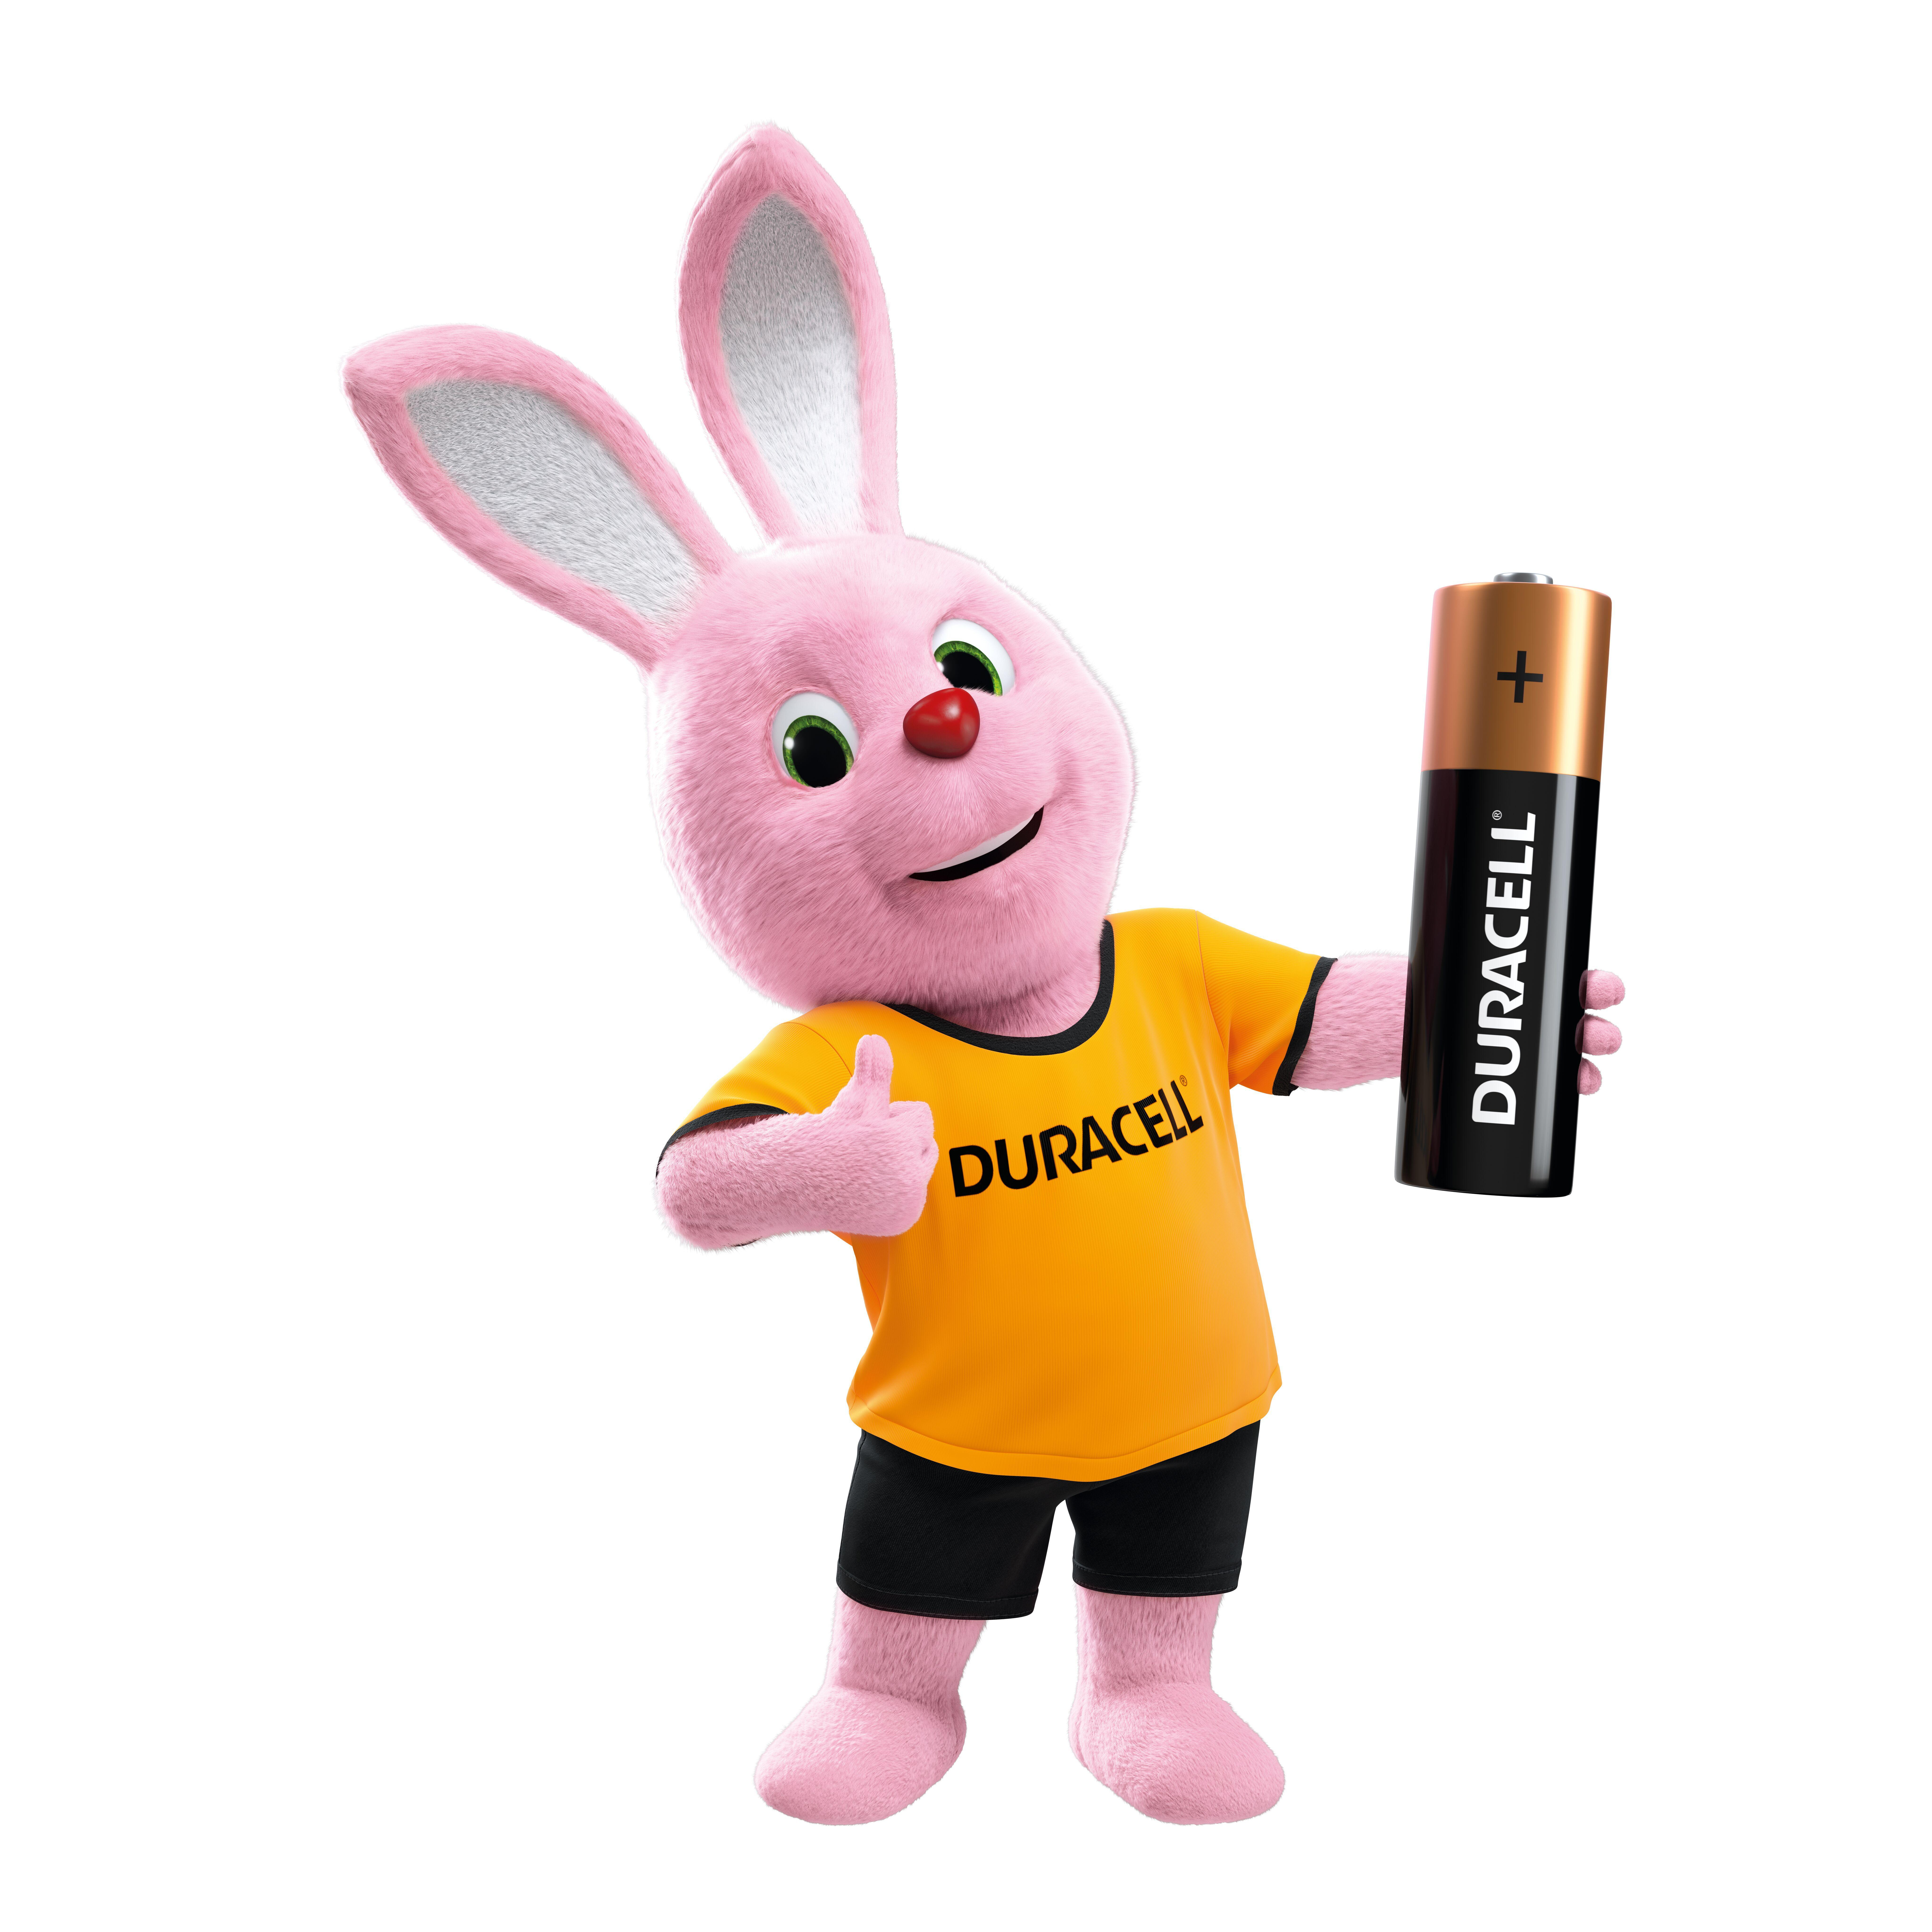 From Psd To Jpg Bunny Bunny Poses 0205 Bunny V5 0 Thumb Up Copper